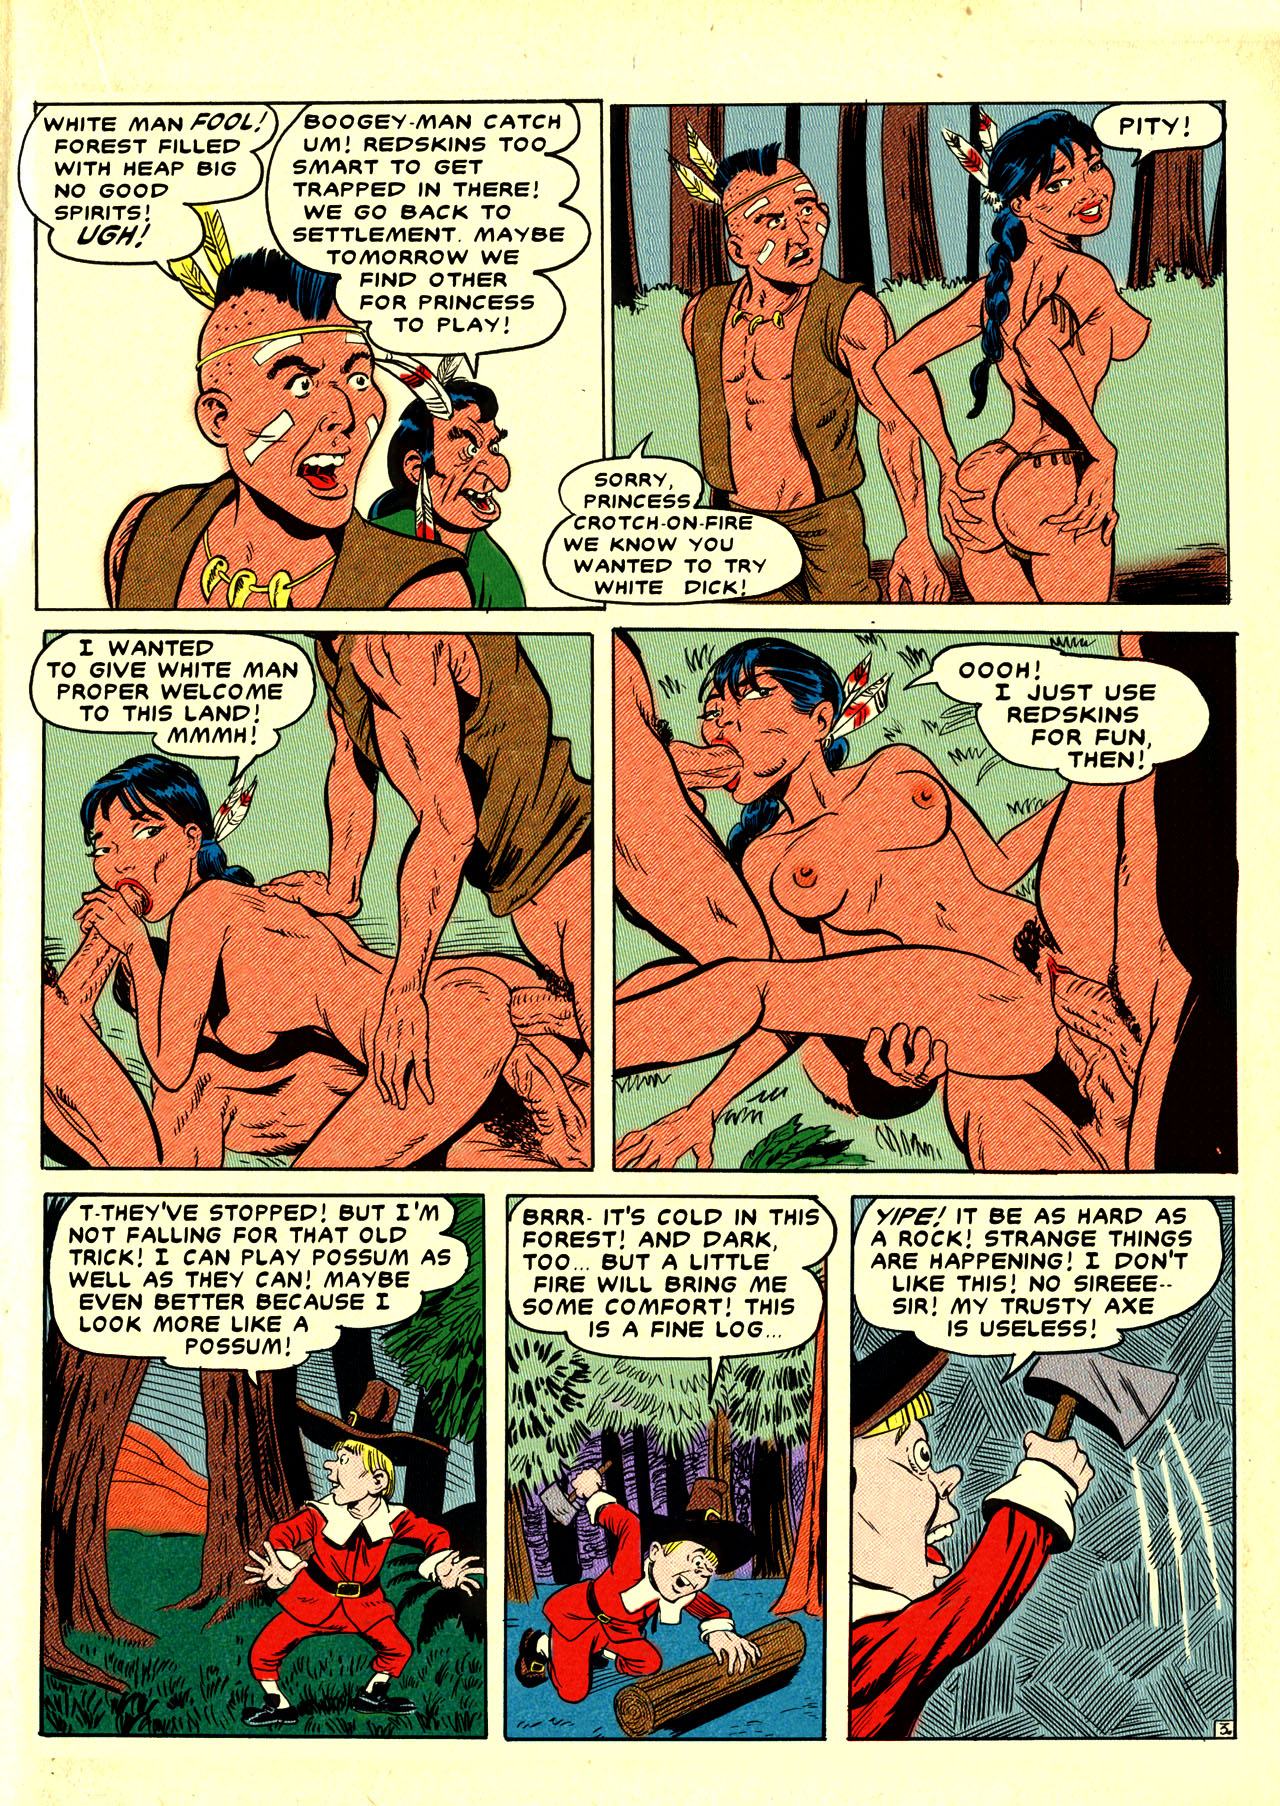 Porn Comic image #9978